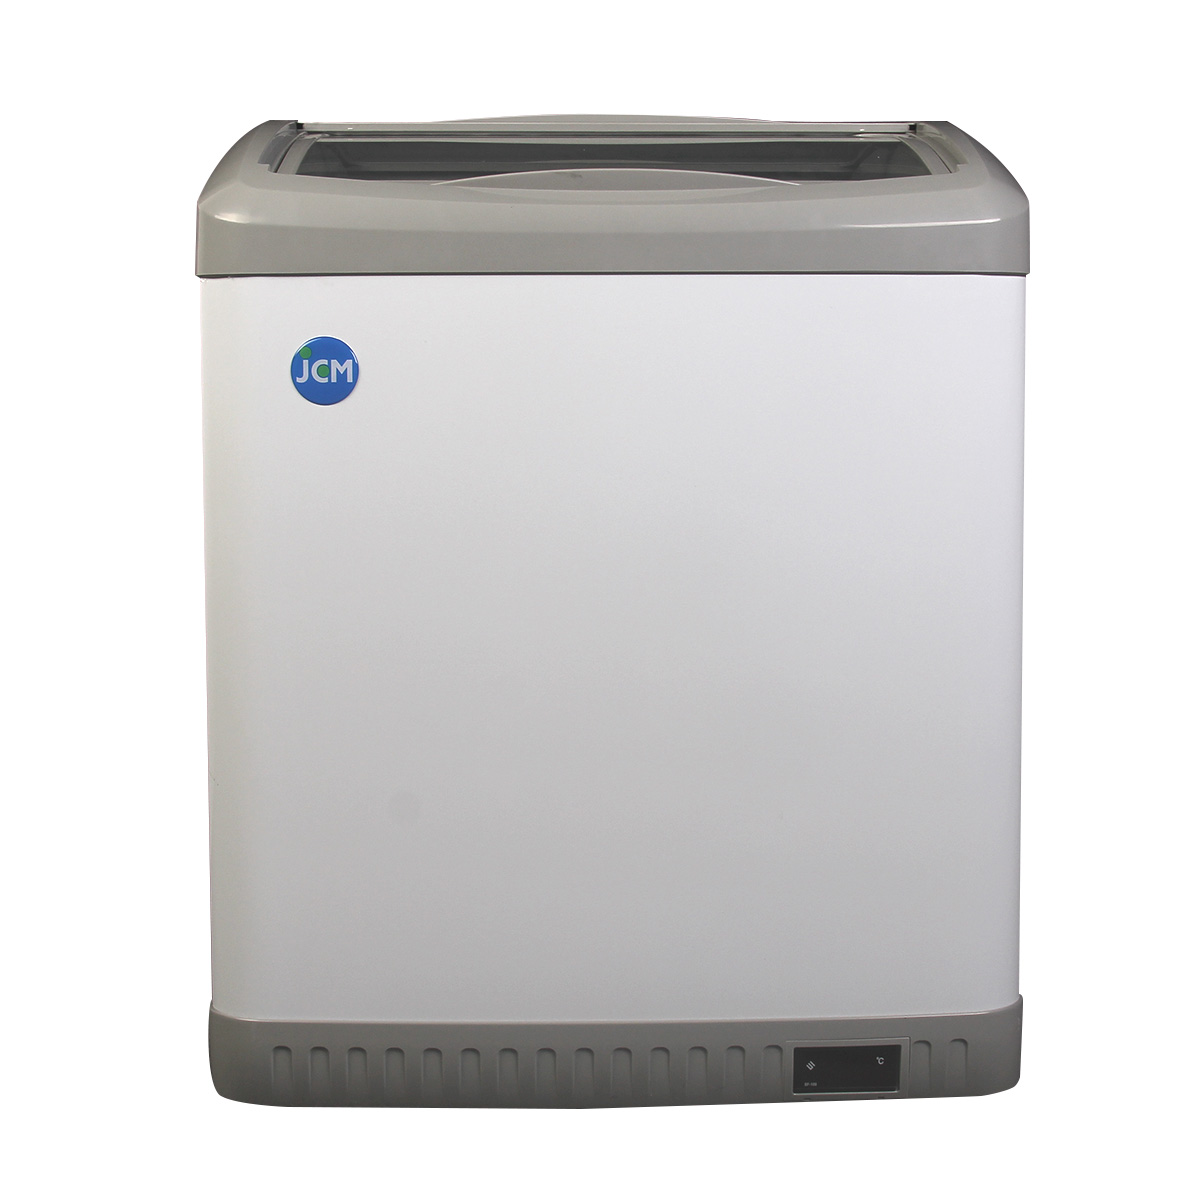 JCM 冷凍ショーケース JCMCS-100 業務用 冷凍 冷凍庫 保冷庫 ショーケース スライド 【代引不可】